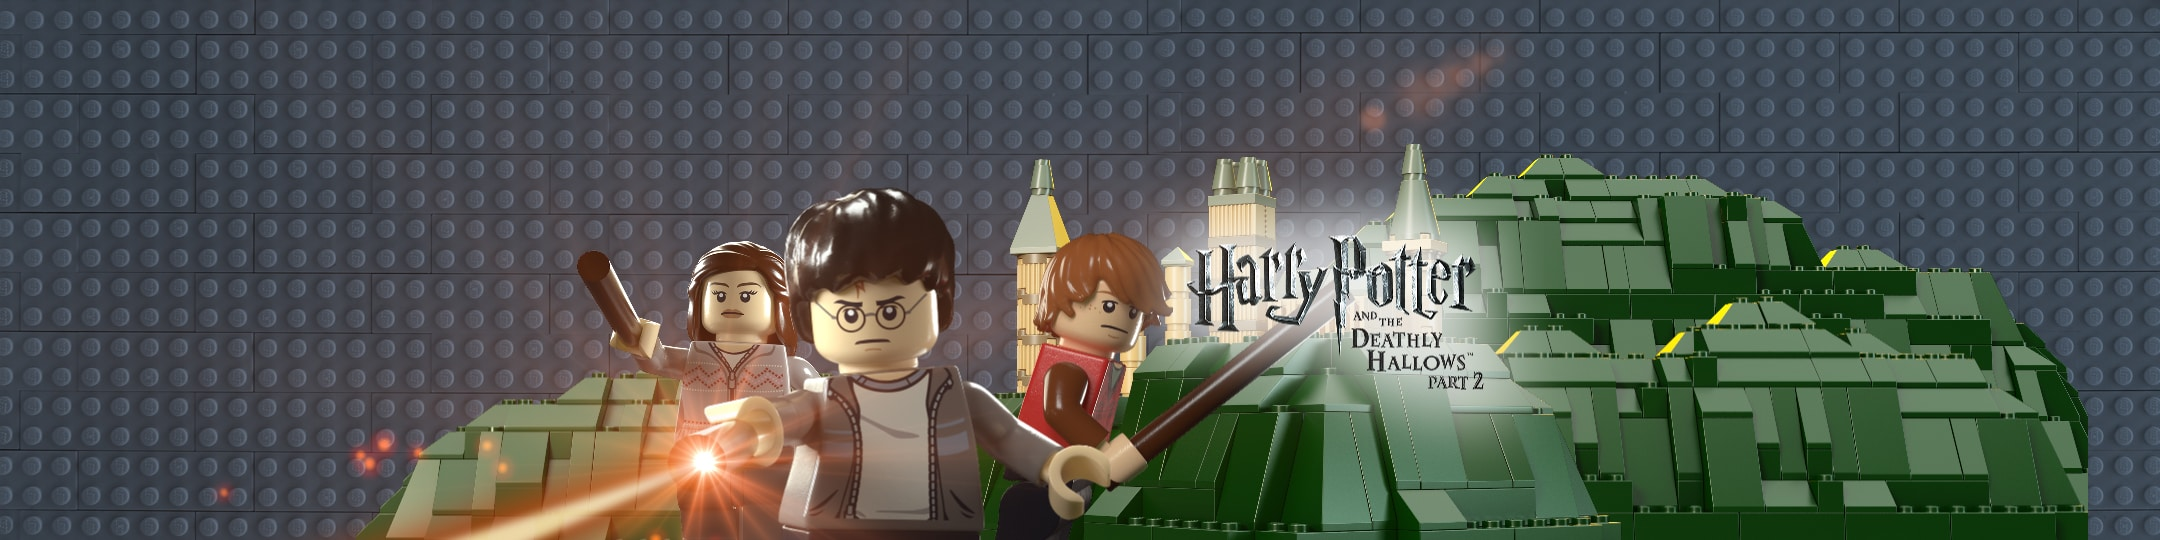 Harry_Potter_7_Flowcase_v02